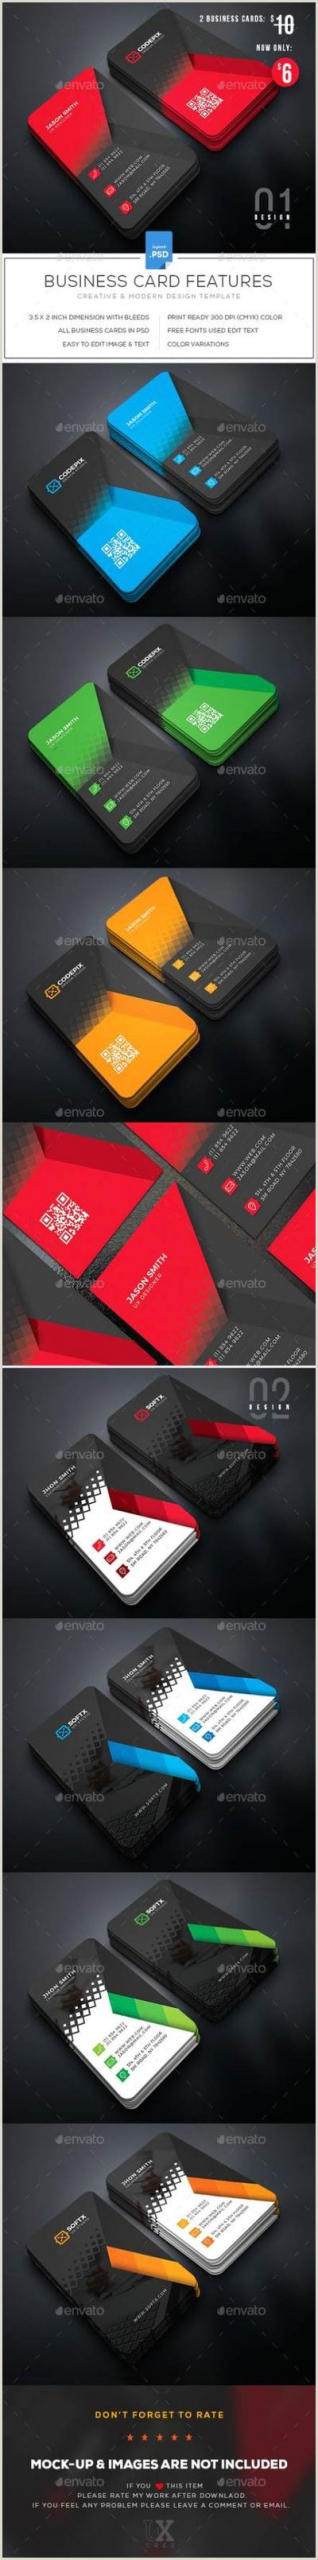 Free Business Card Designs Templates Creative Modern Polygon Business Card